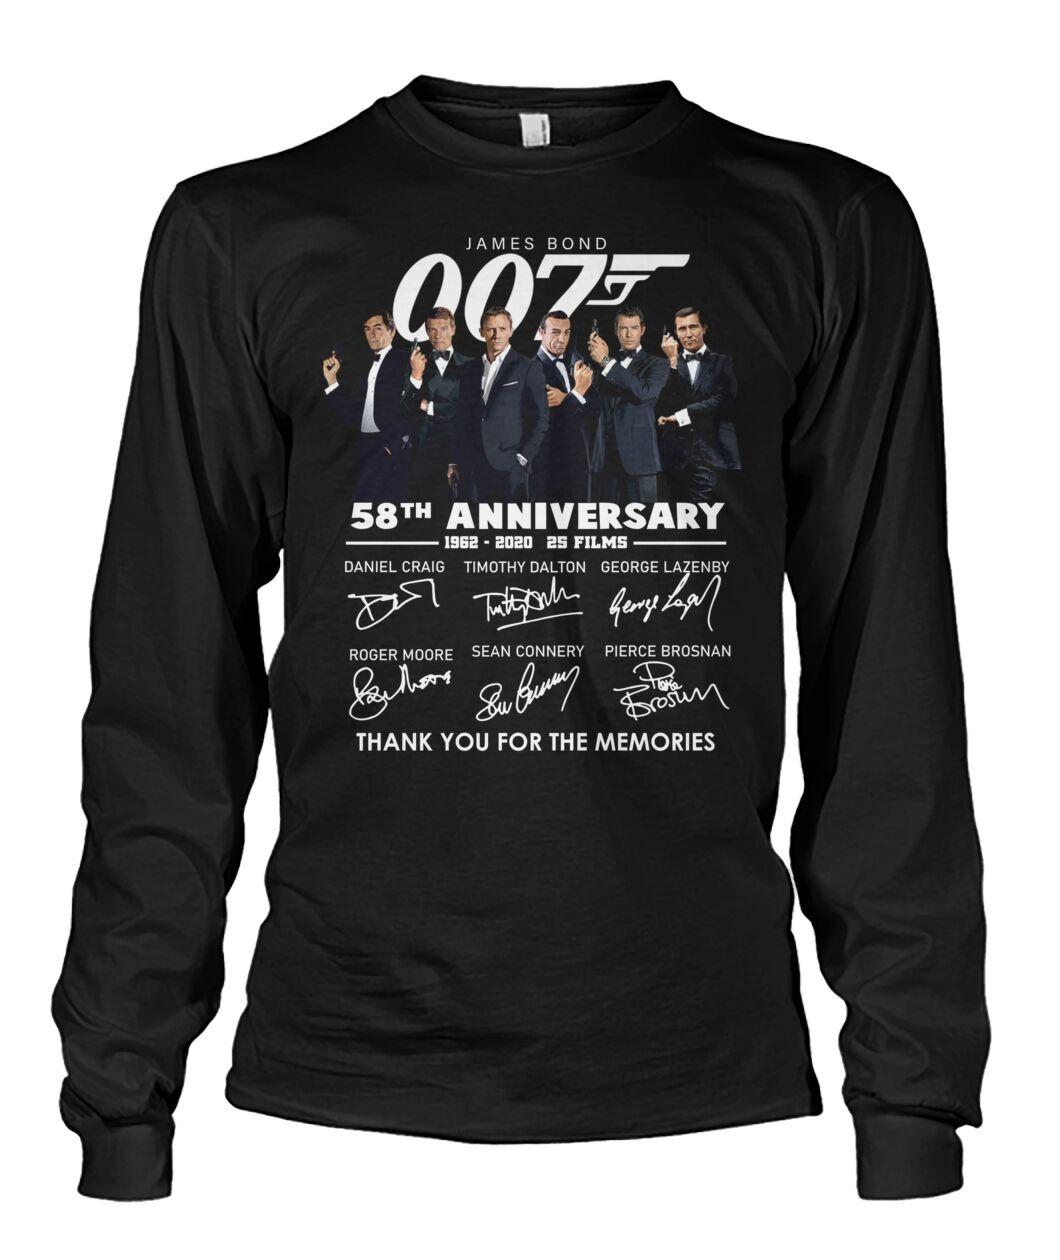 007 James Bond 58th Anniversary Long sleeve